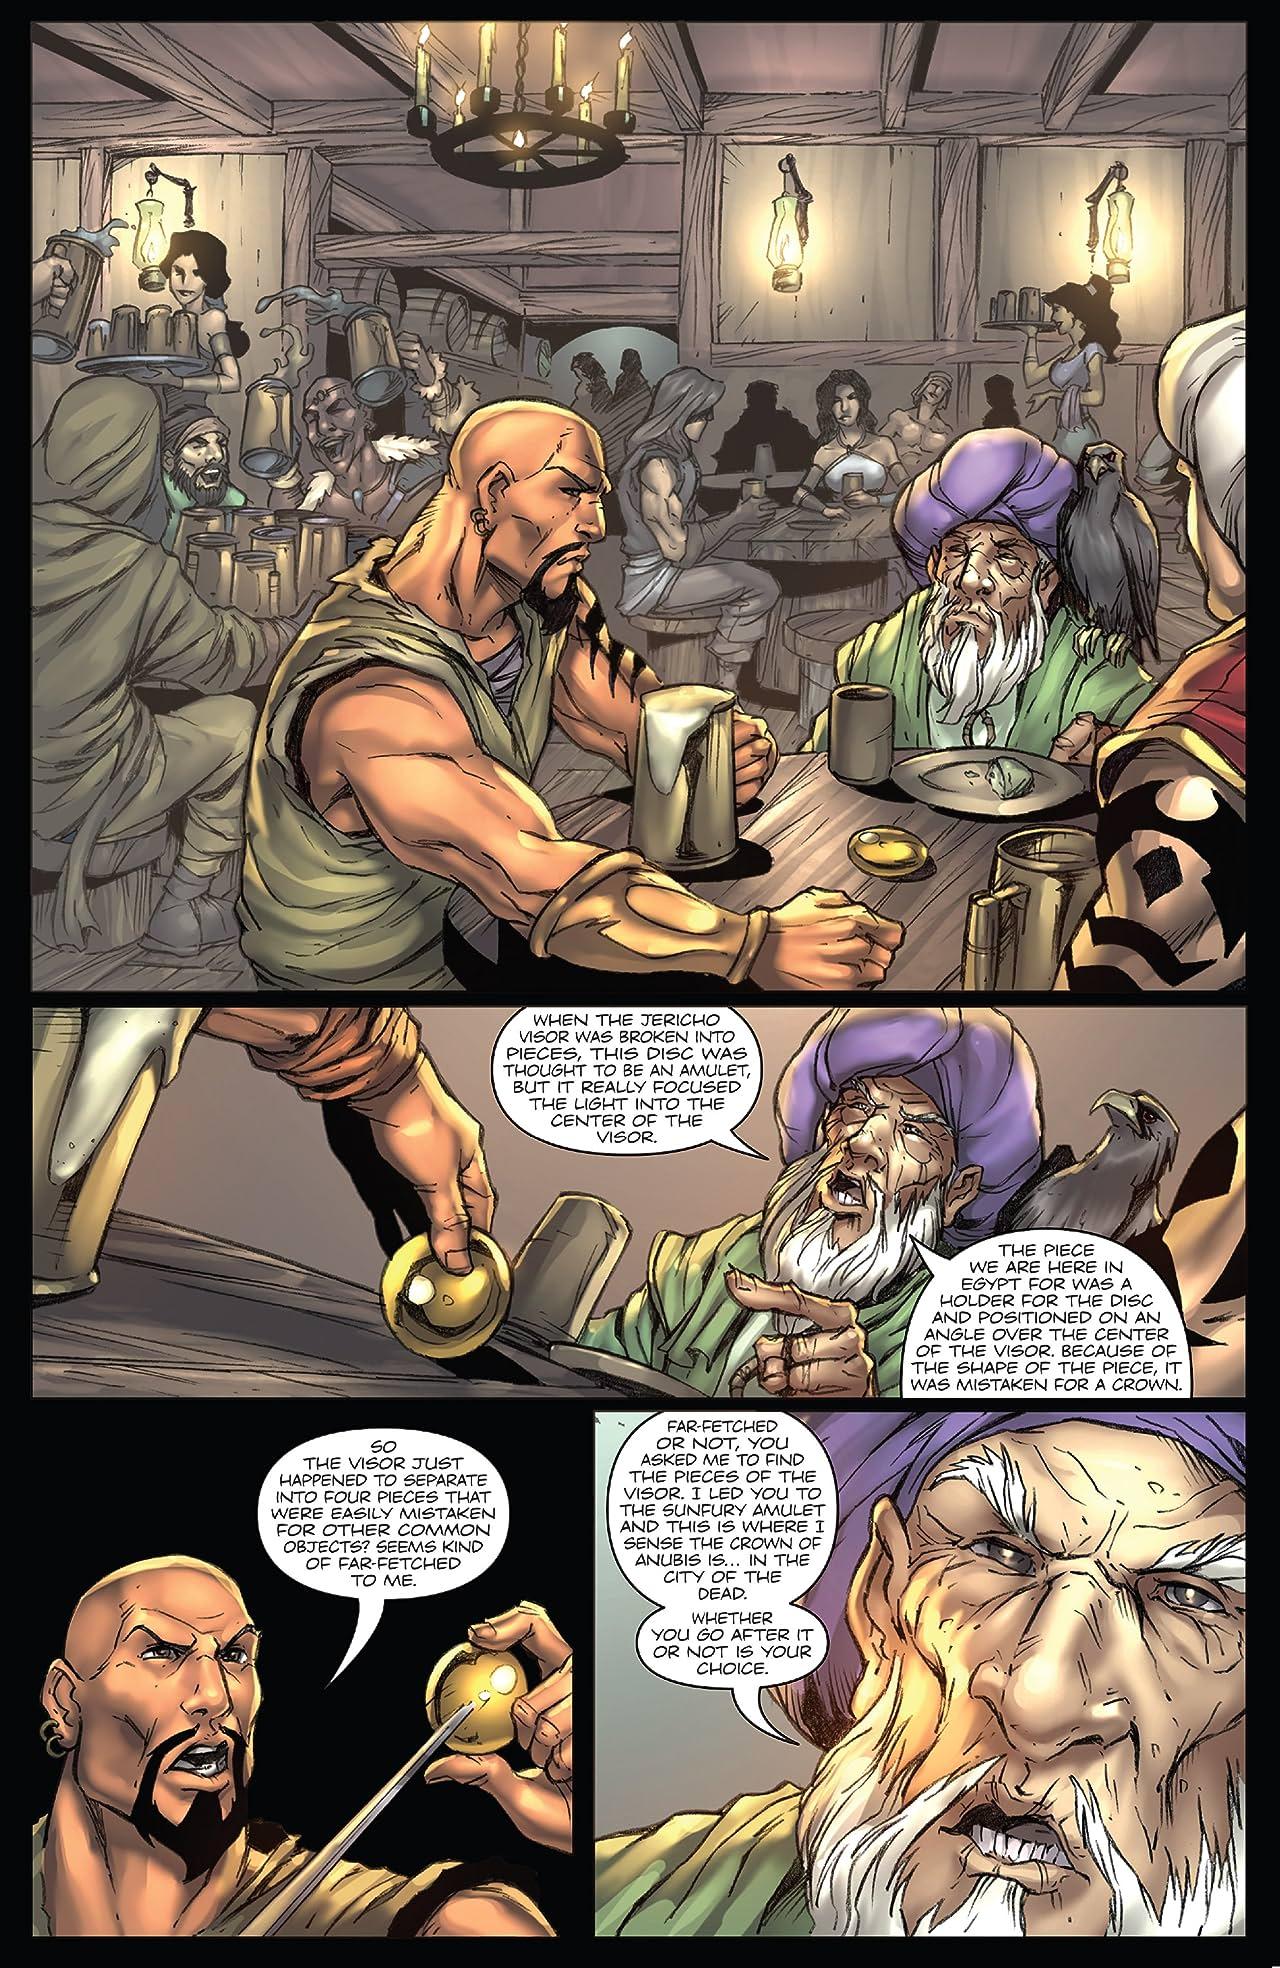 1001 Arabian Nights: The Adventures of Sinbad #8